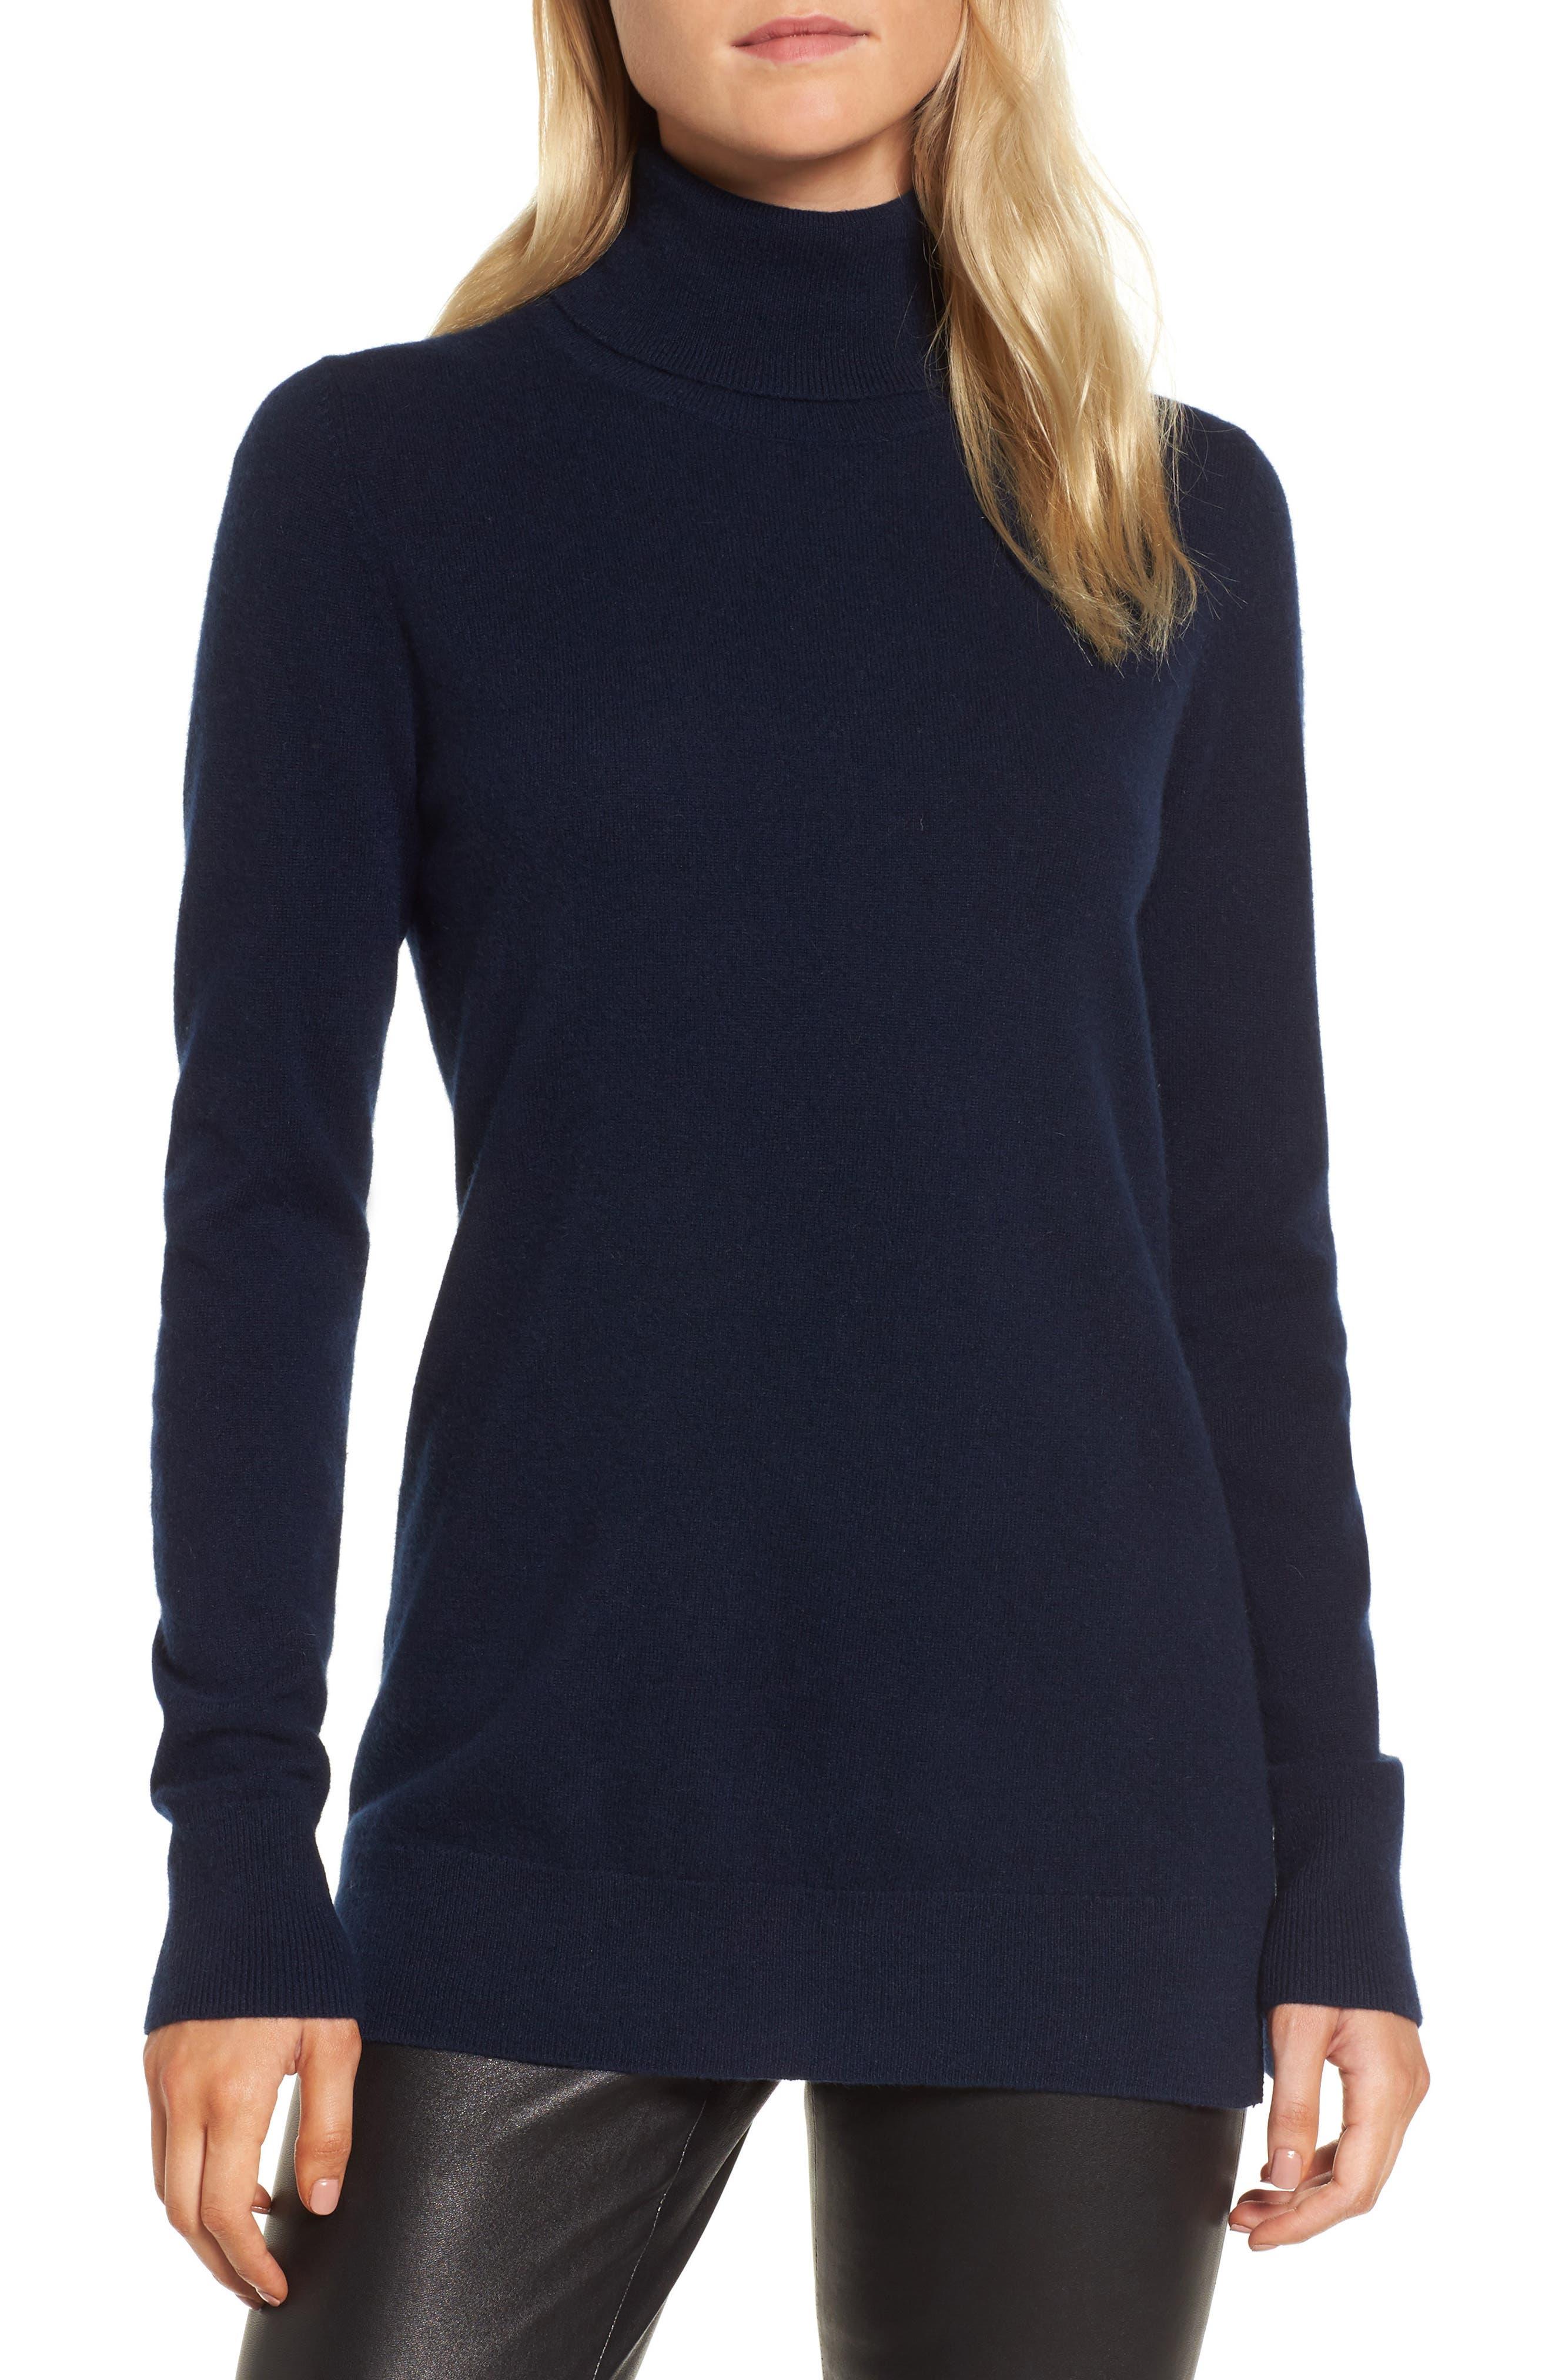 Alternate Image 1 Selected - Nordstrom Signature Turtleneck Cashmere Sweater